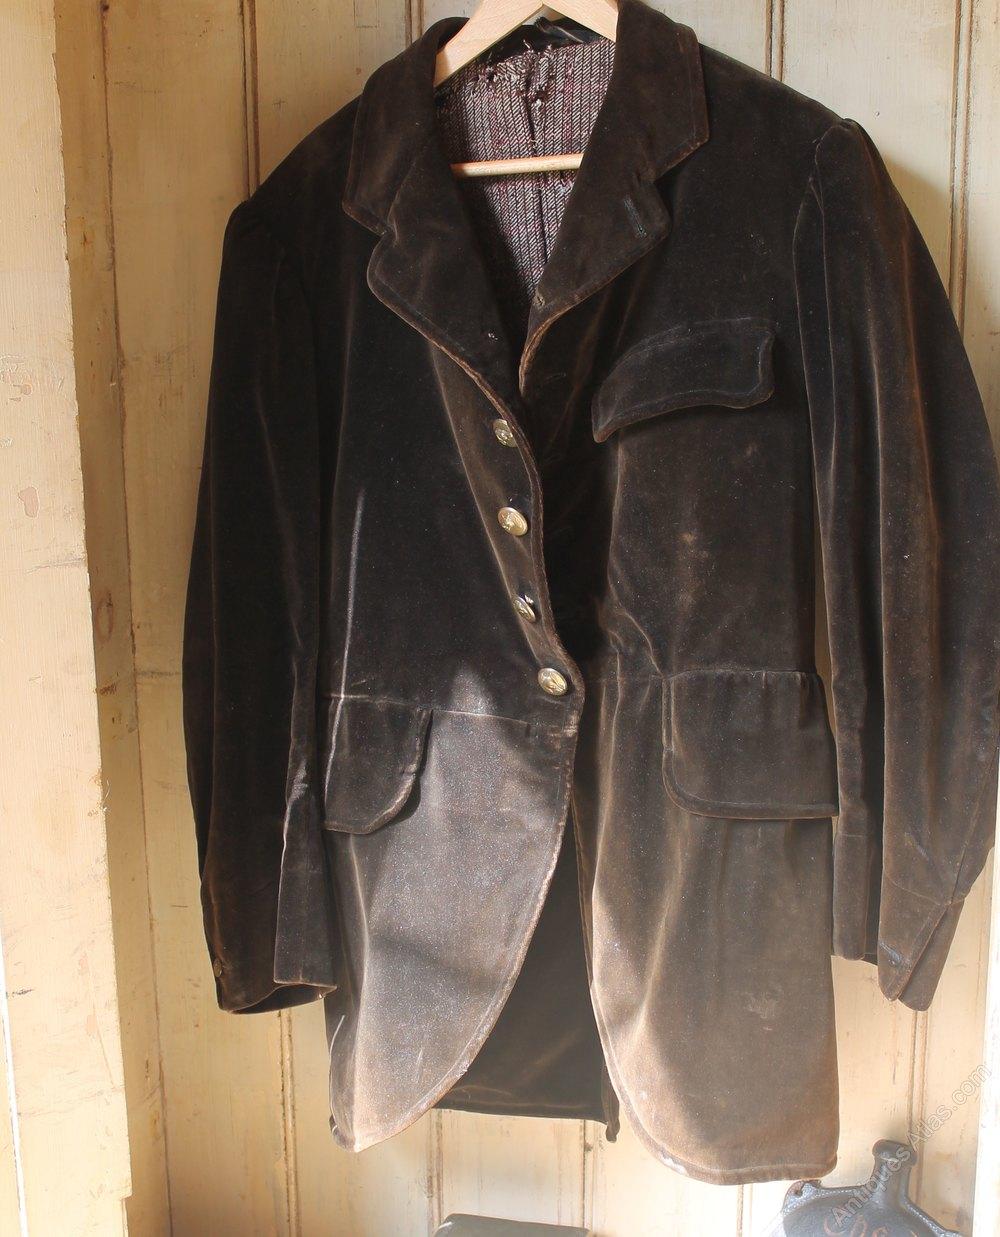 English_gamekeepers_jacket_or__as226a334z-2.jpg